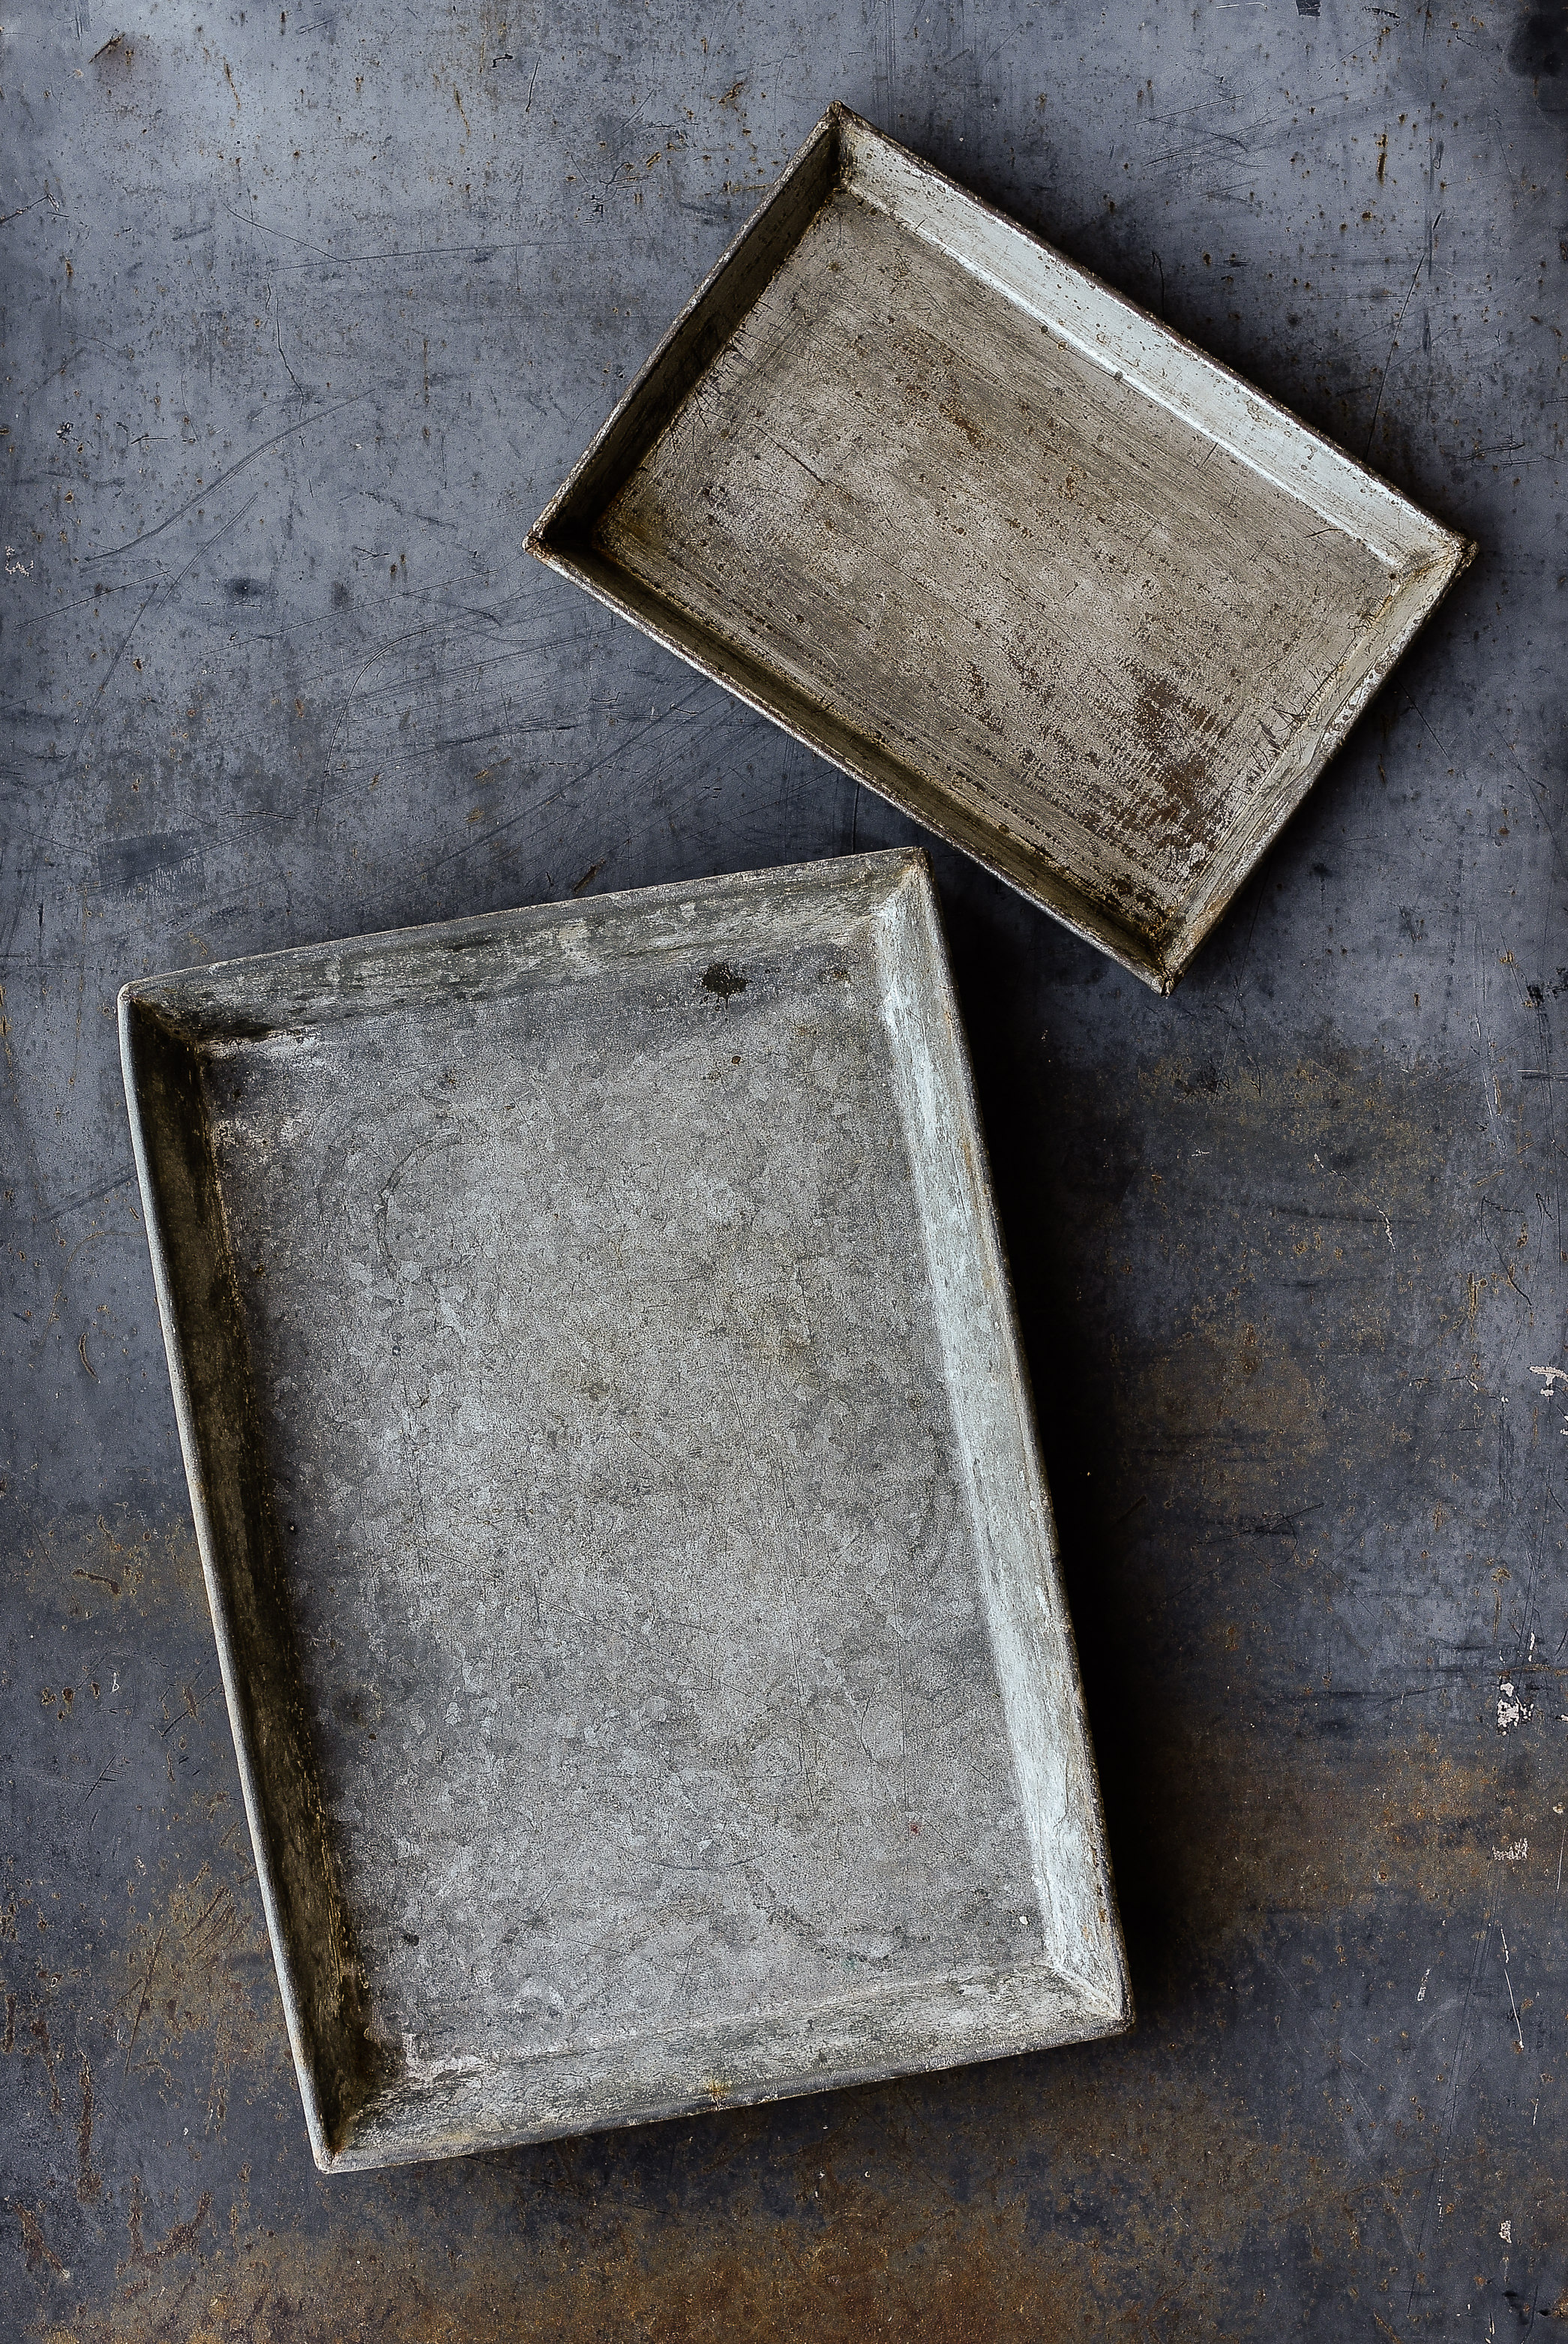 Vintage zinc trays farmhouse decor boxwoodavenue.com